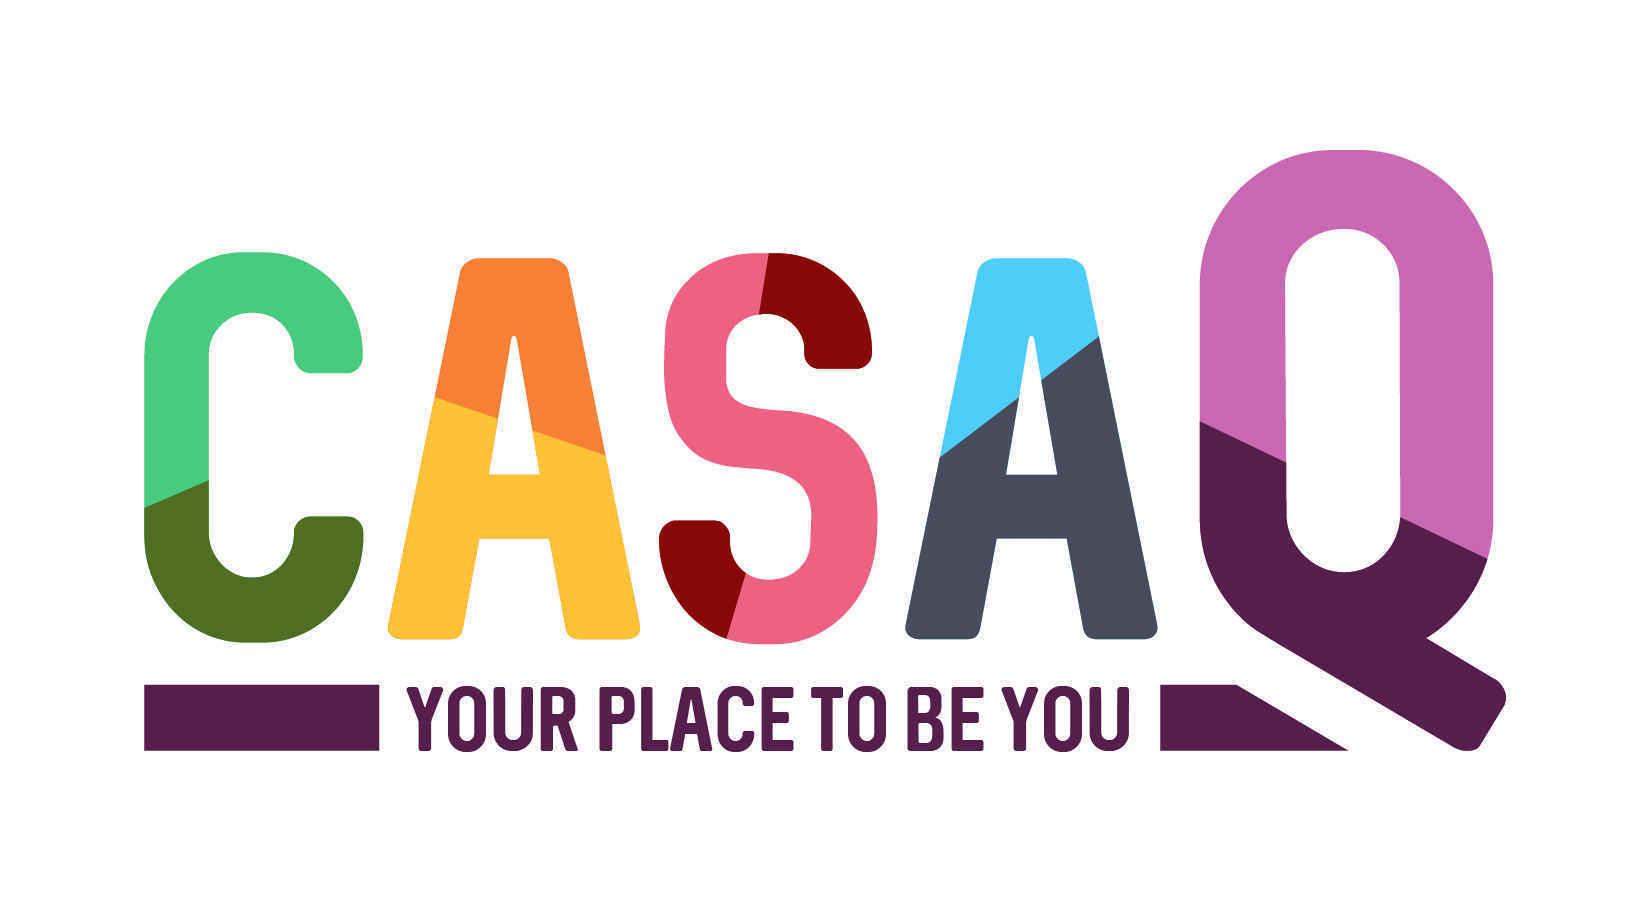 Please support Casa Q! image